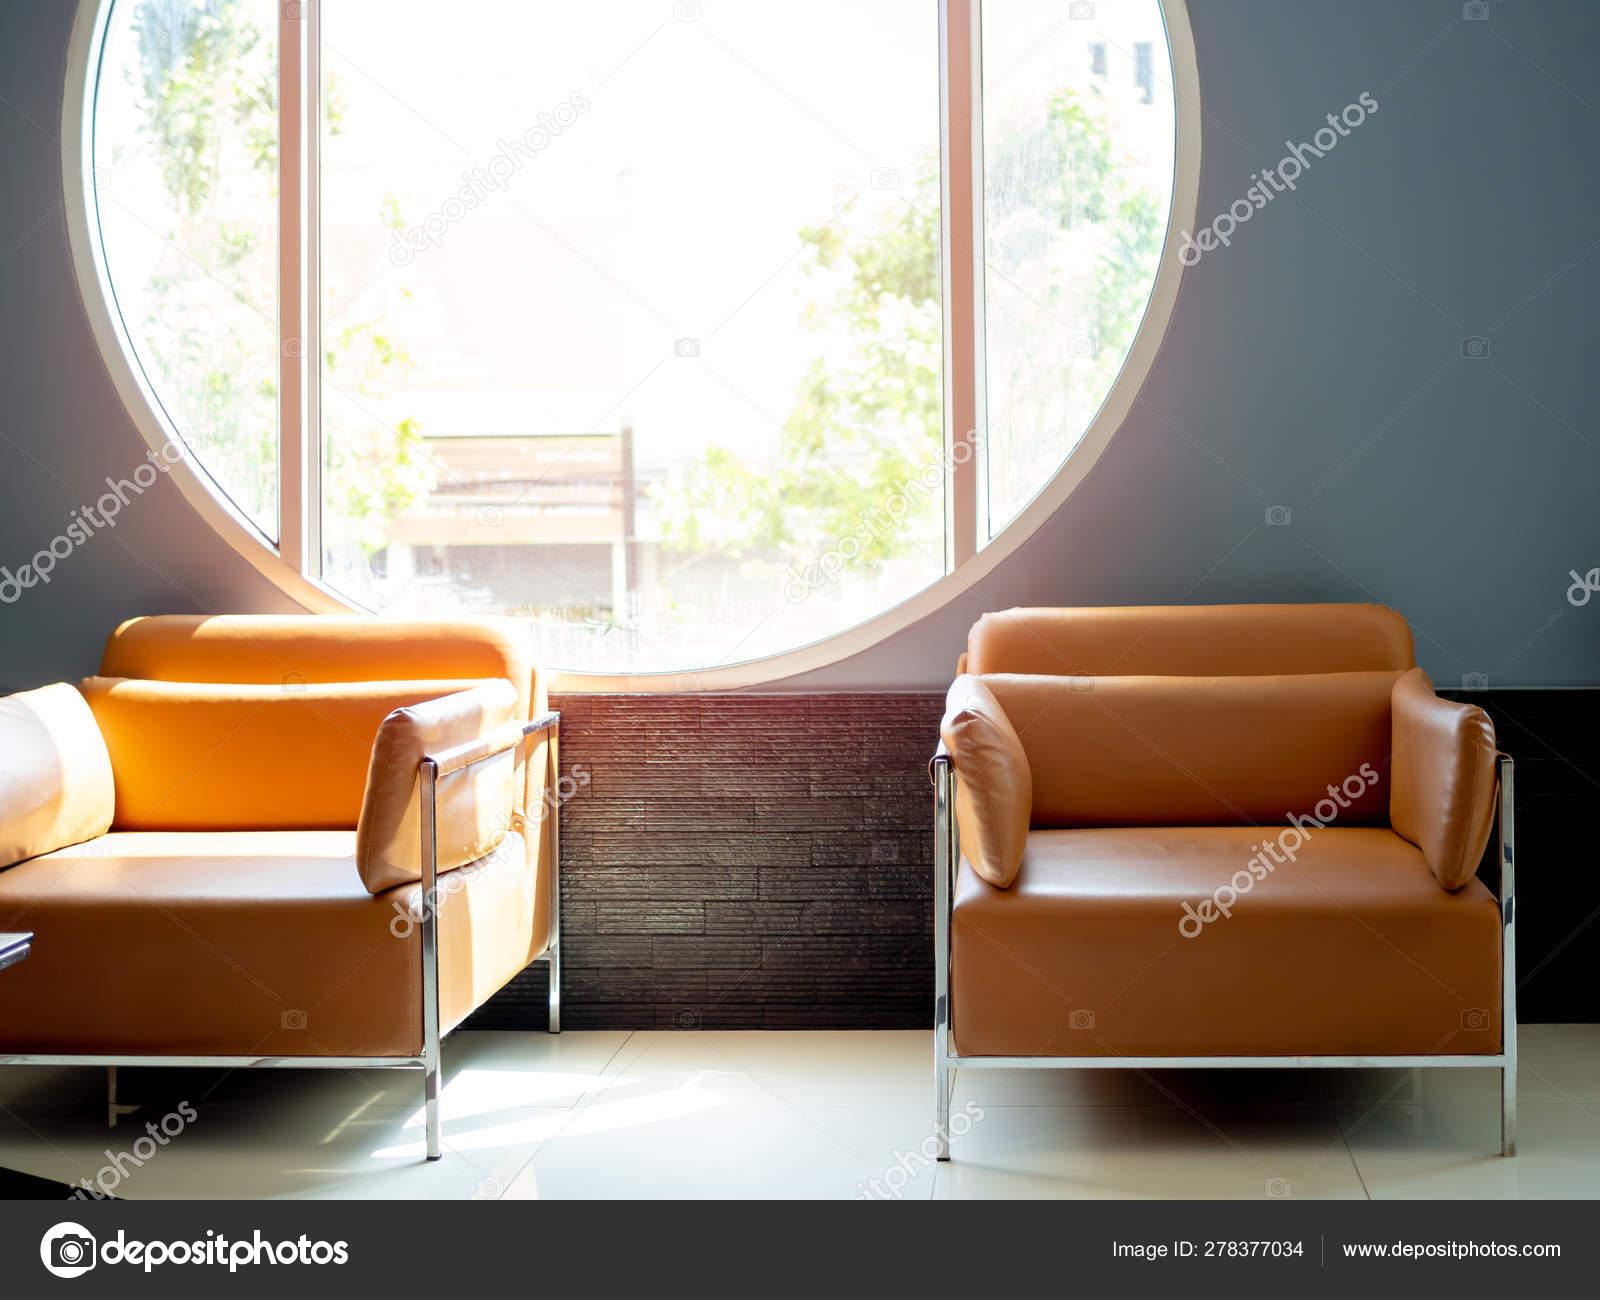 Fabulous Modern Orange Leather Sofa On Blue Background With Round Machost Co Dining Chair Design Ideas Machostcouk